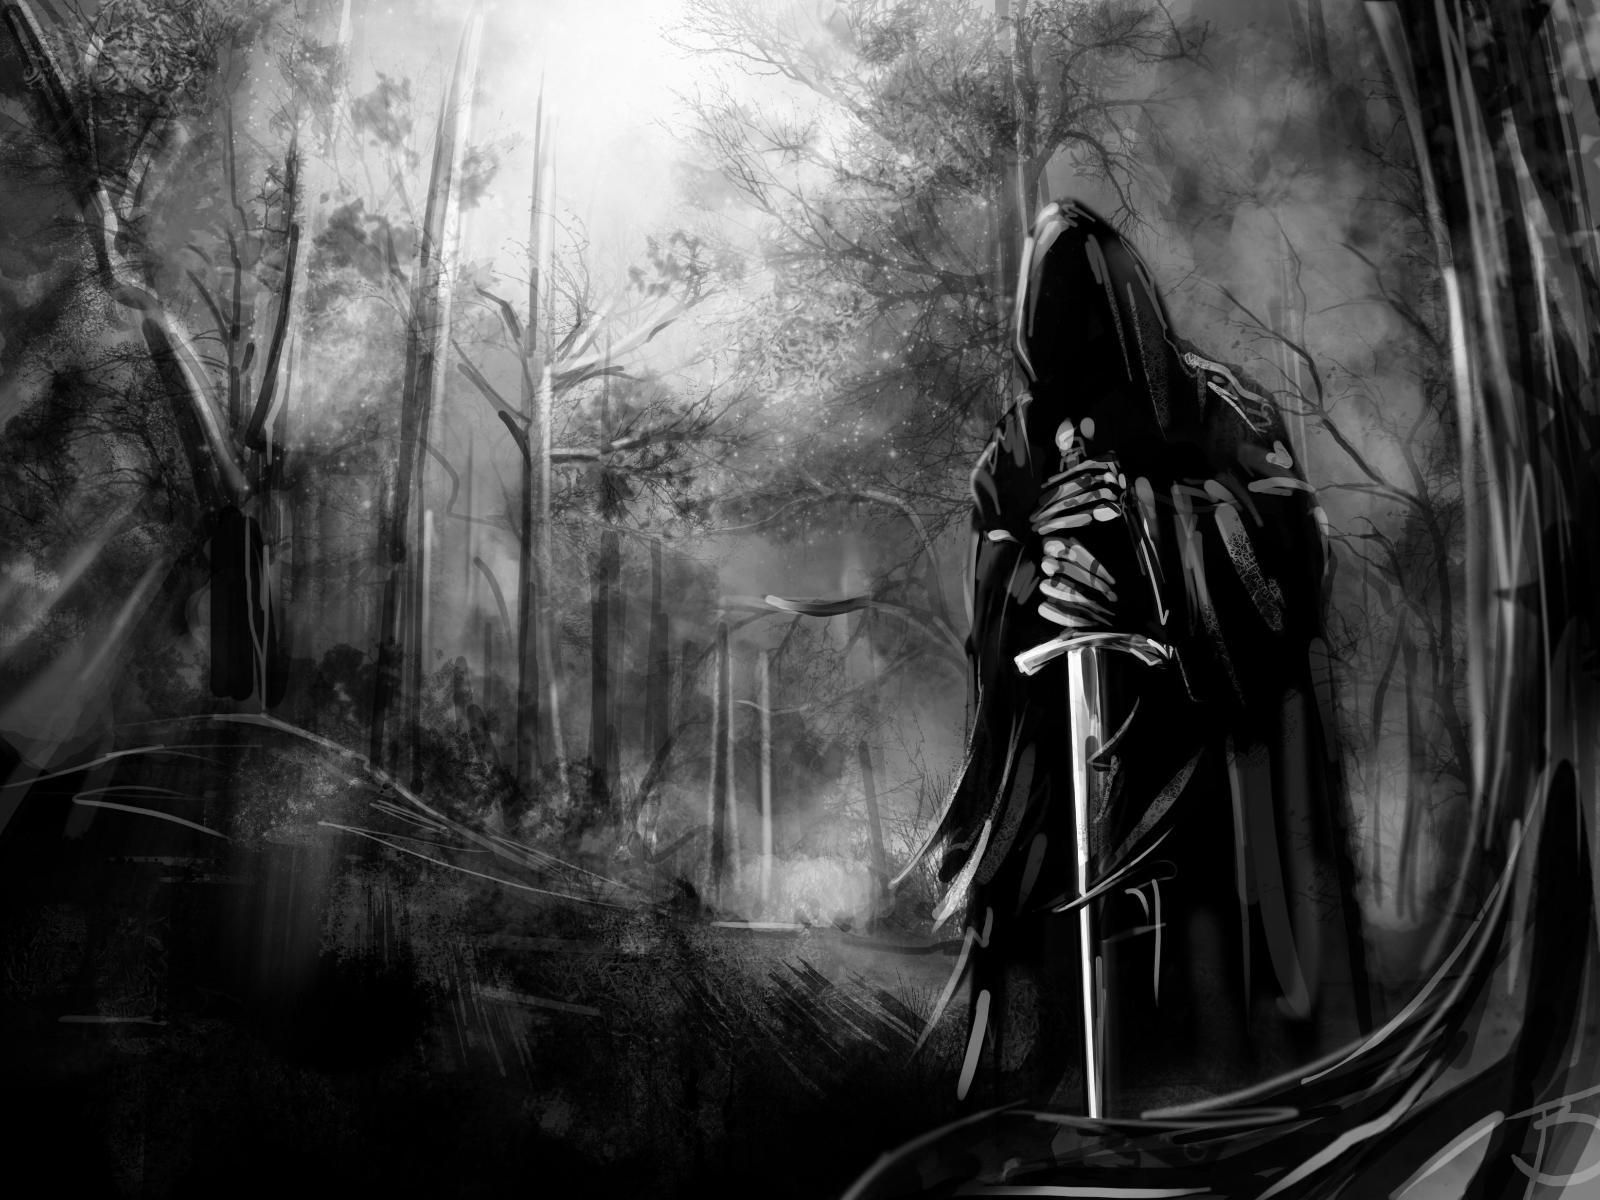 Reaper Wallpaper wallpaper Scary Grim Reaper Wallpaper hd wallpaper 1600x1200